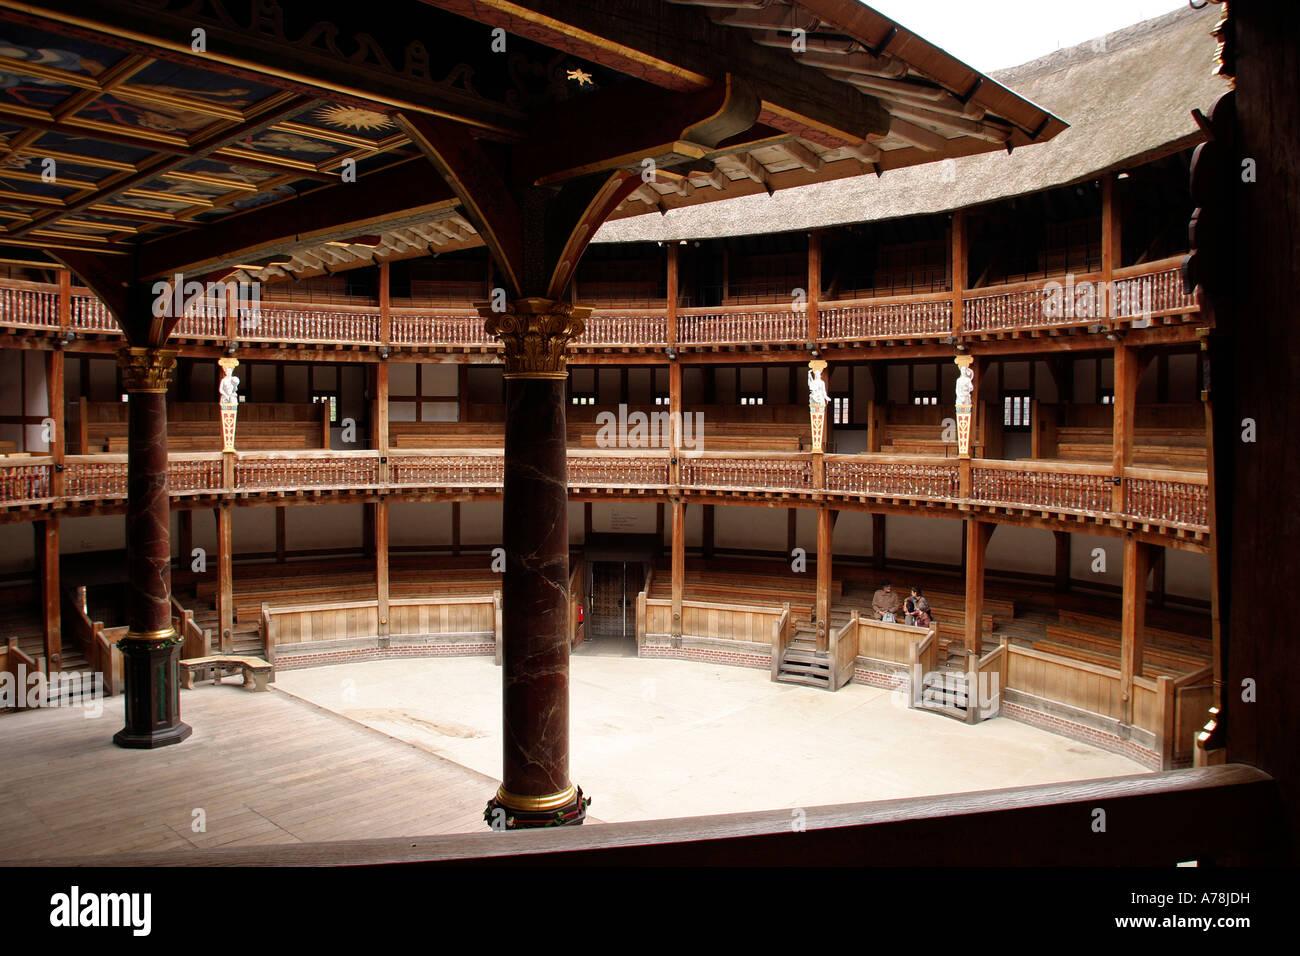 UK London Bankside Shakespeares Globe Theatre the auditorium - Stock Image